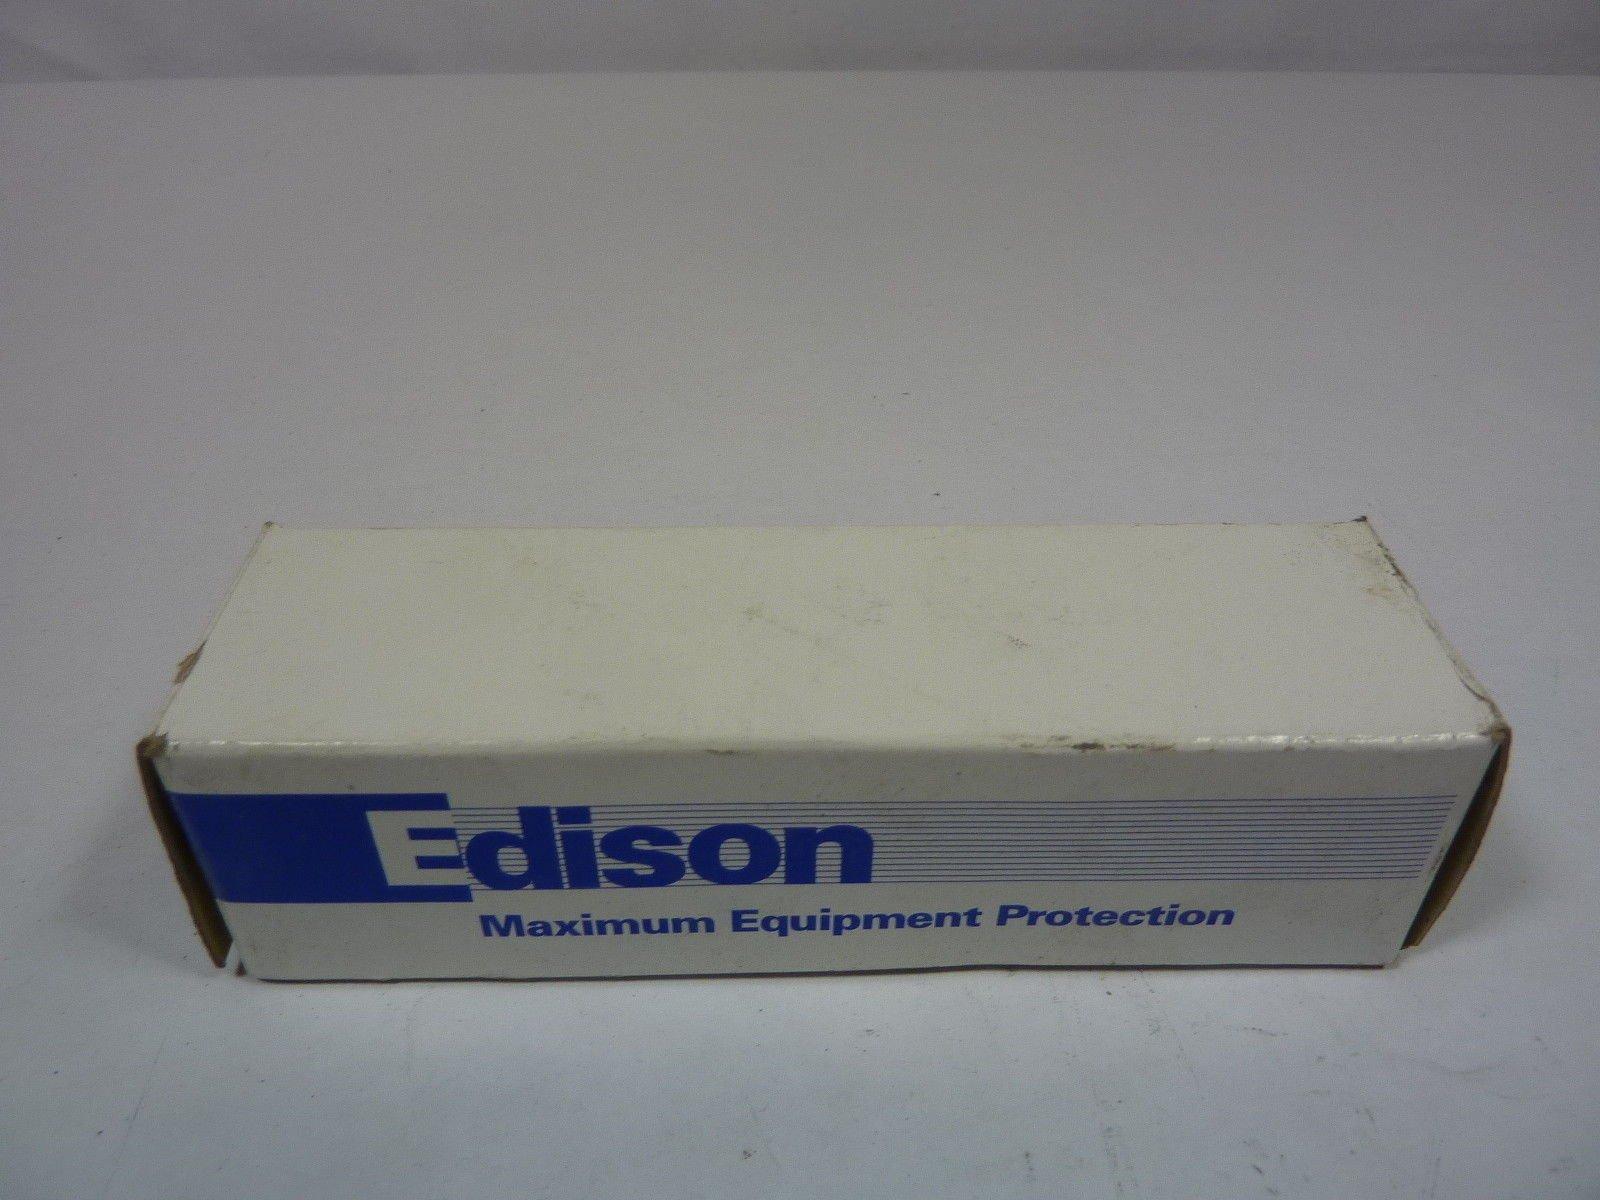 Edison JDL125 Fuse 125A